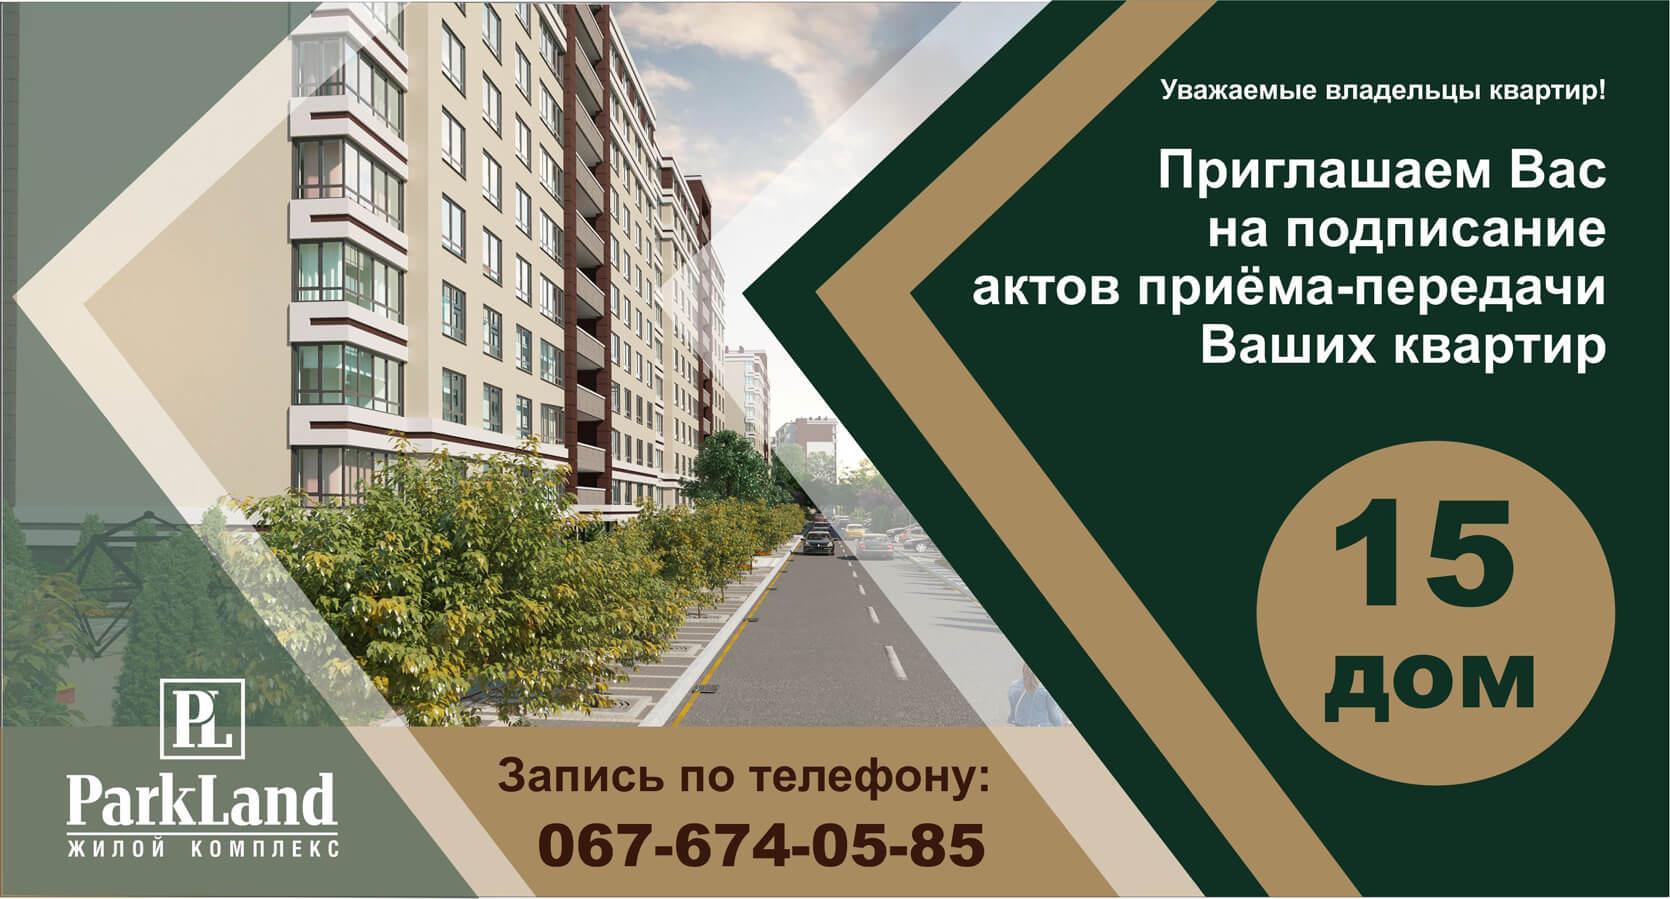 news-221018-1park-land-ru